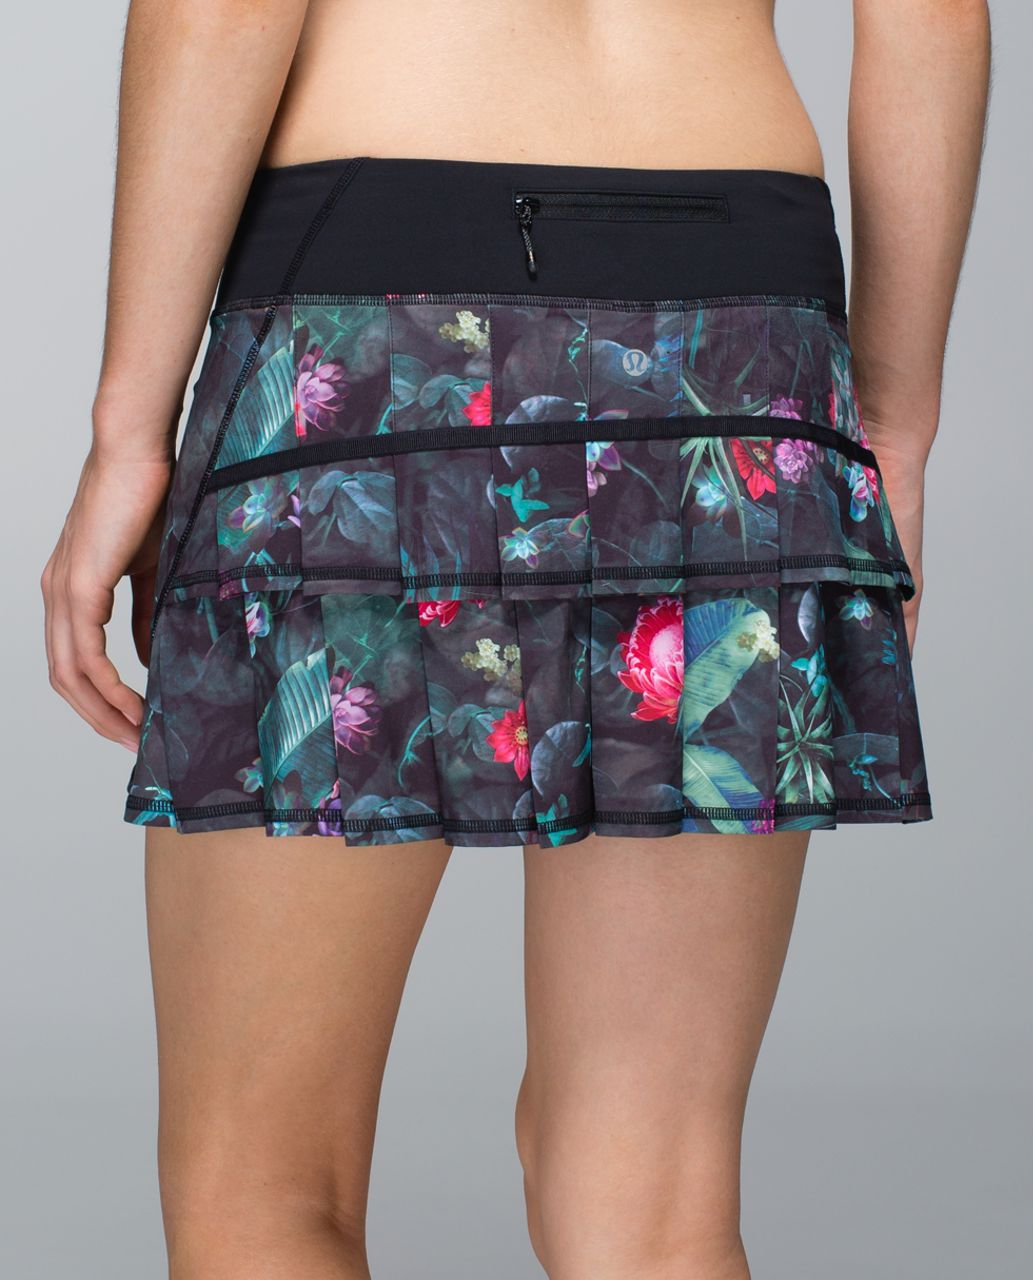 cbca34a47 Lululemon Run: Pace Setter Skirt *4-way Stretch (Regular) - Curious Jungle  Multi / Black - lulu fanatics